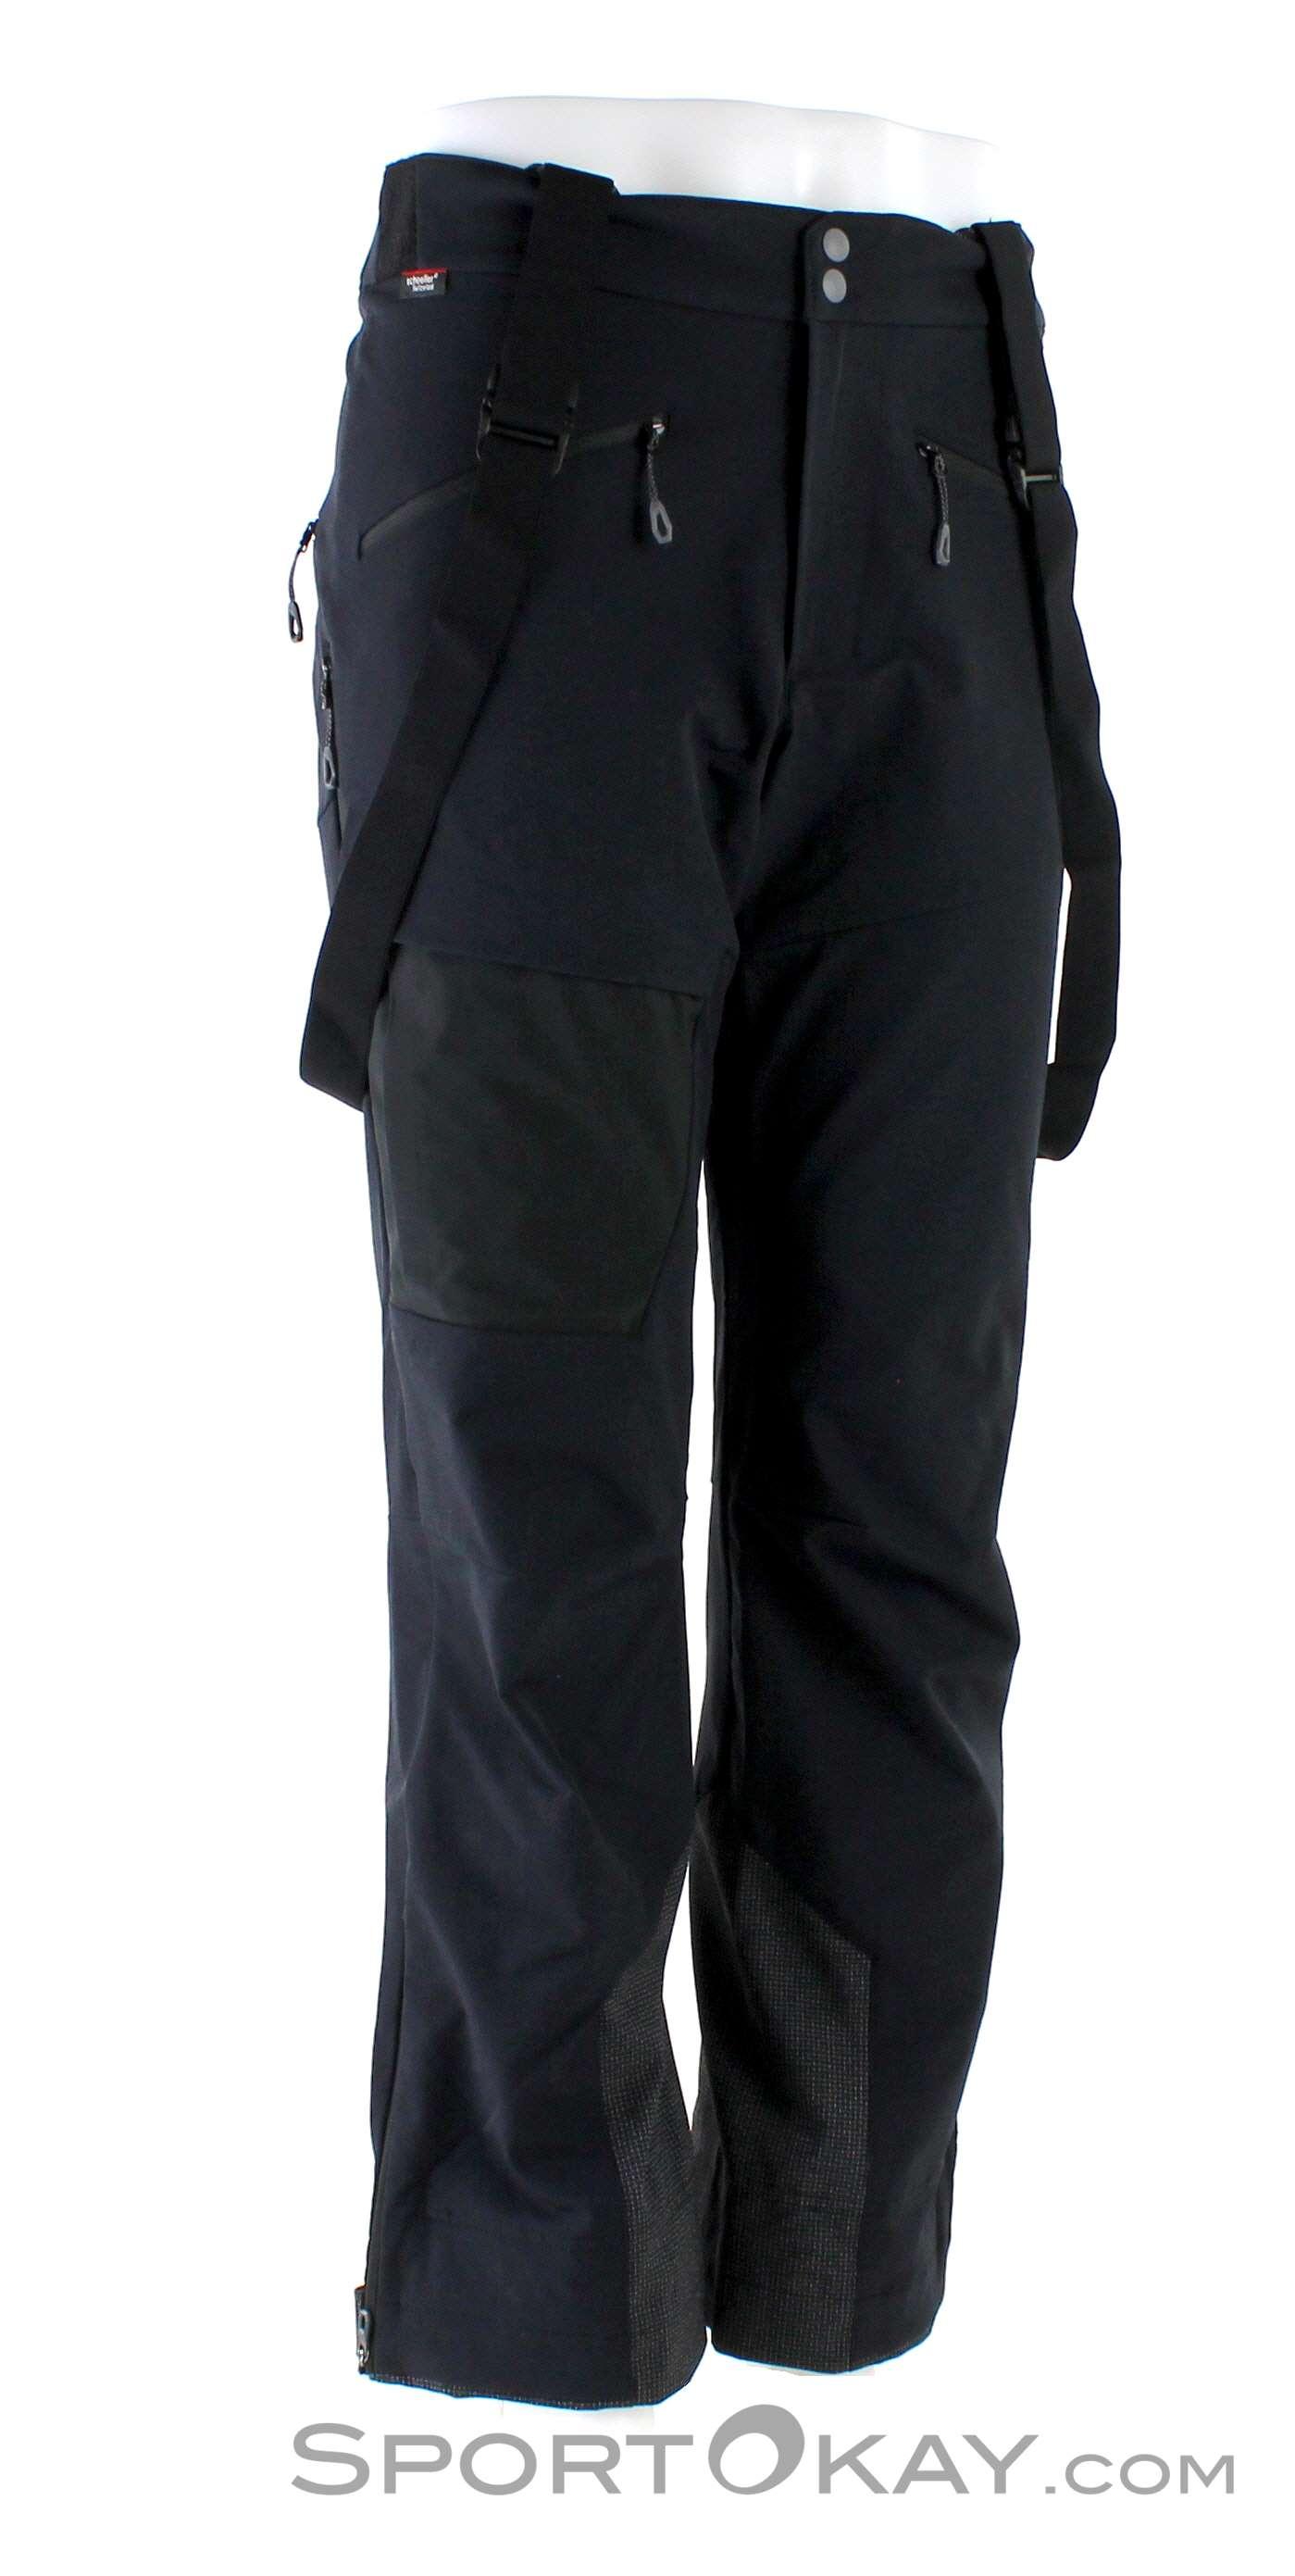 new product 8eaa4 e1e13 Mammut Mammut Base Jump SO Mens Ski Touring Pants Regular